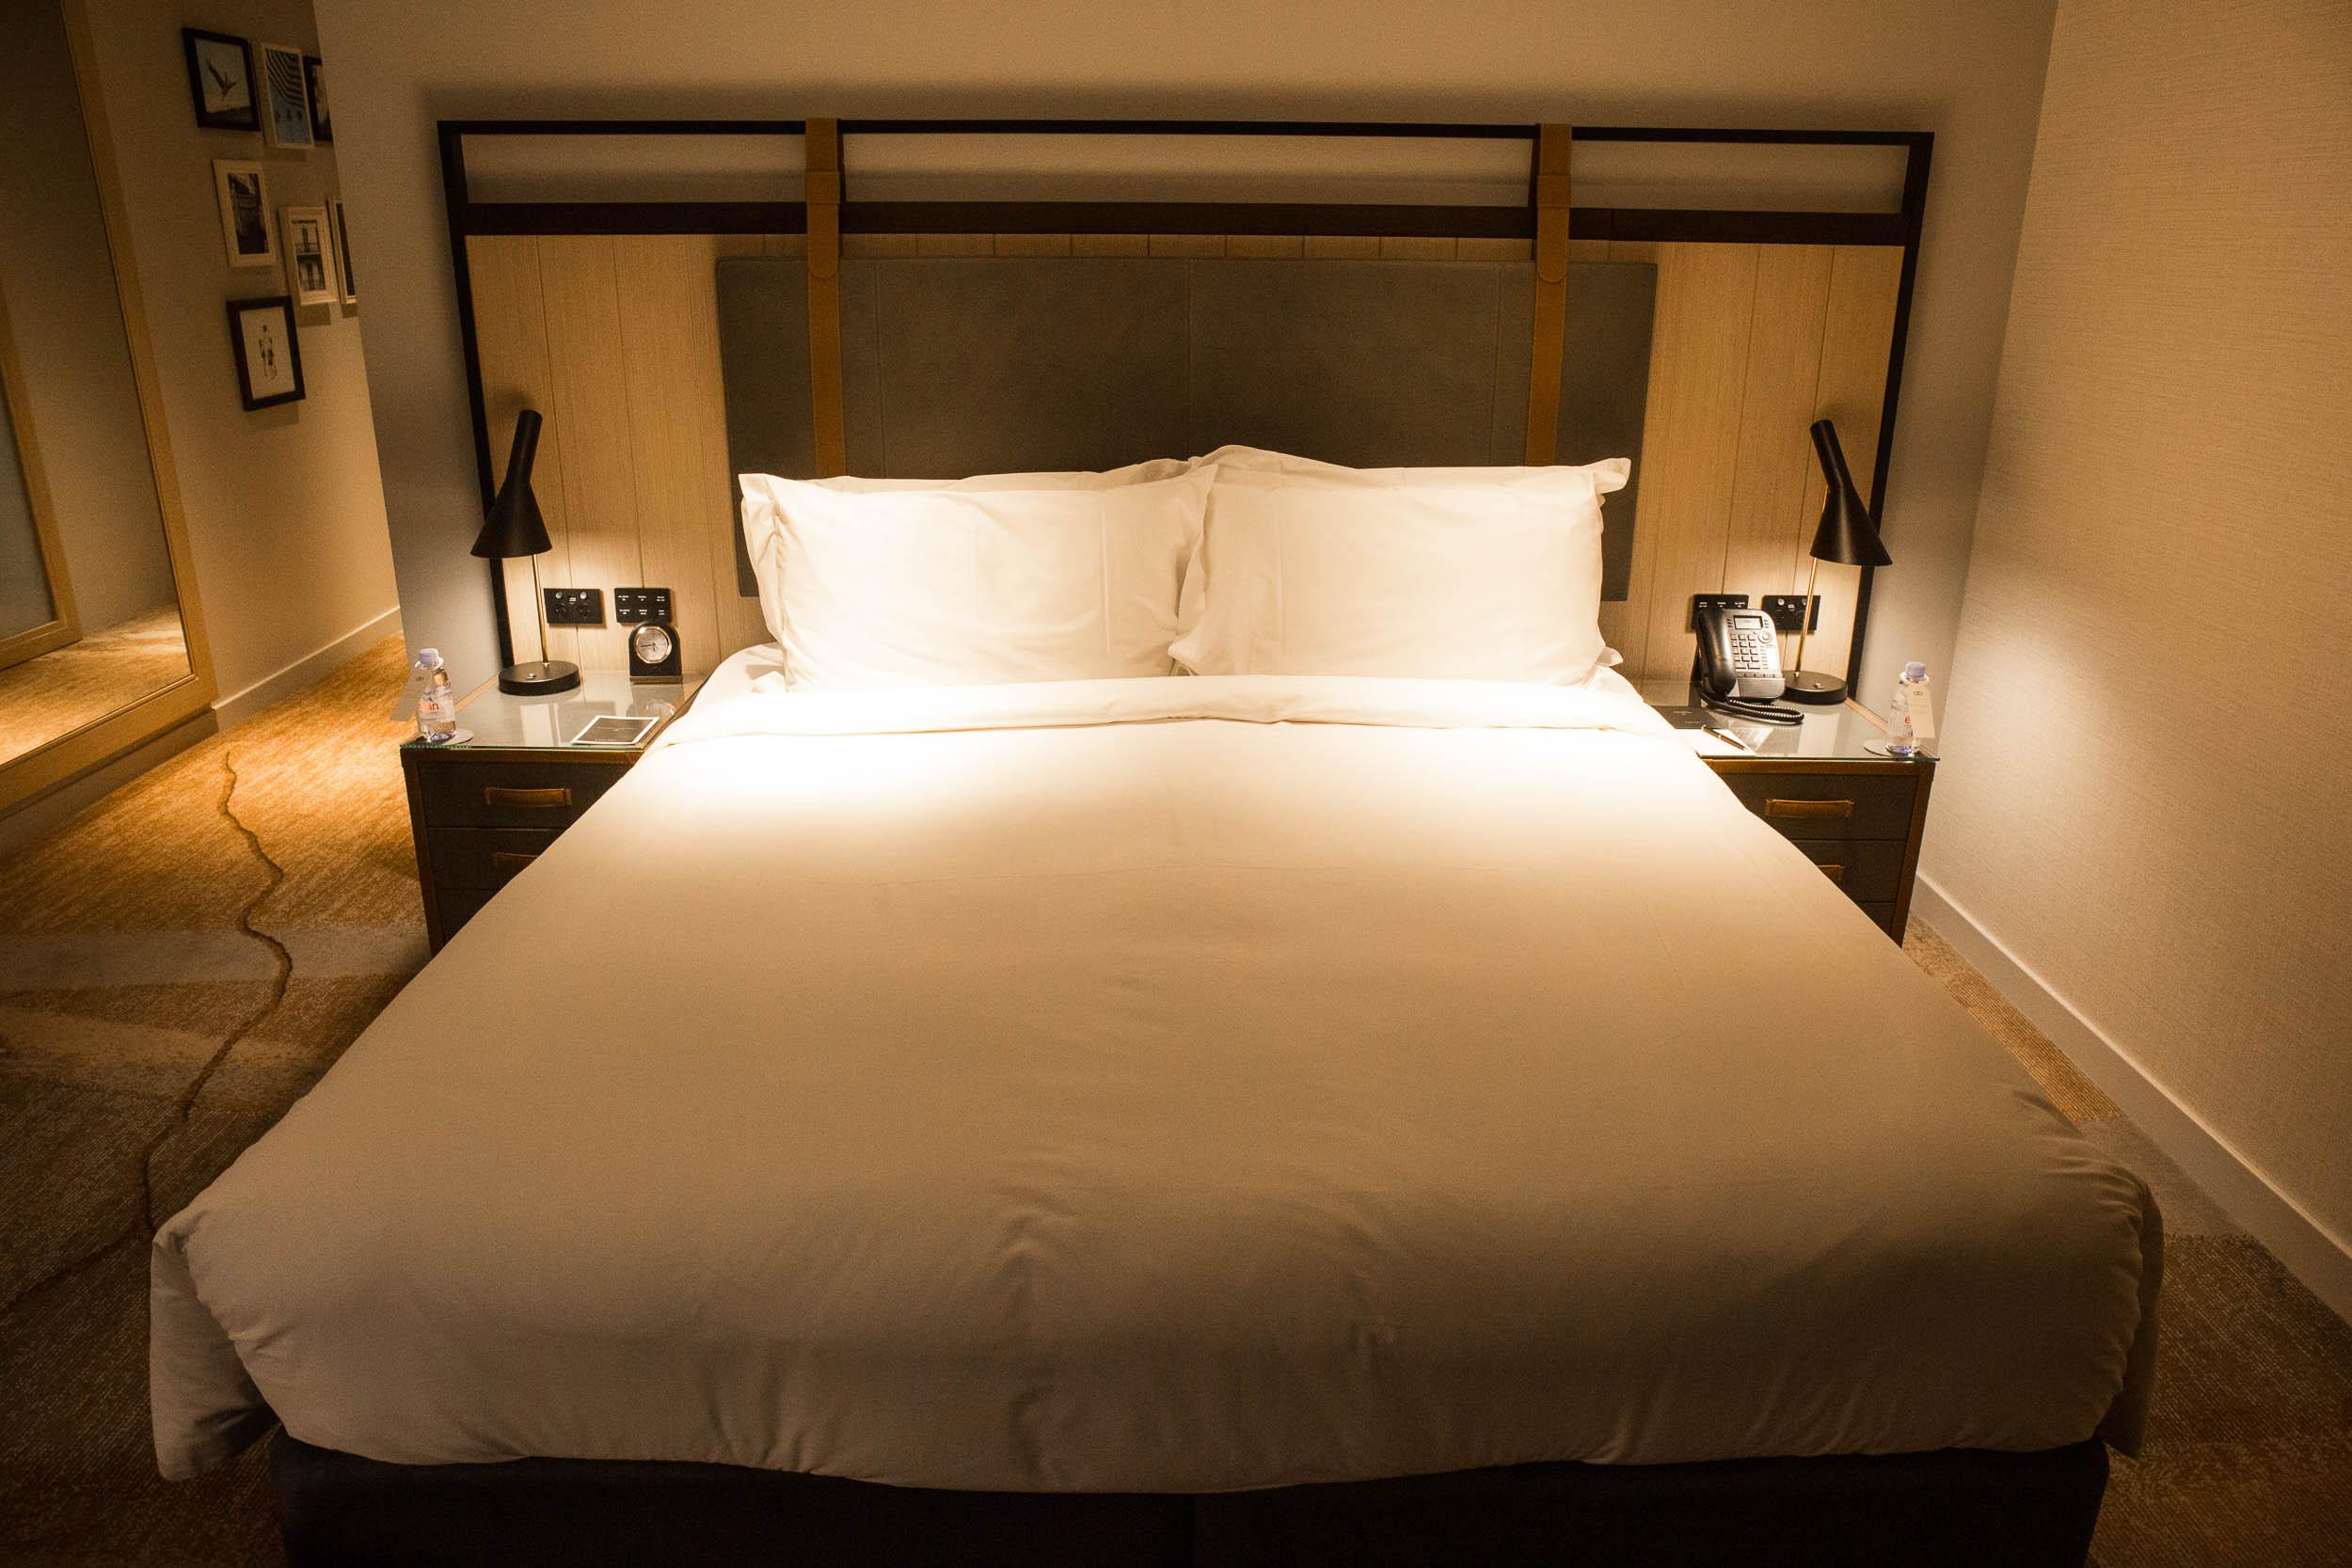 Sofitel Sydney Darling Harbour (Bed).jpg